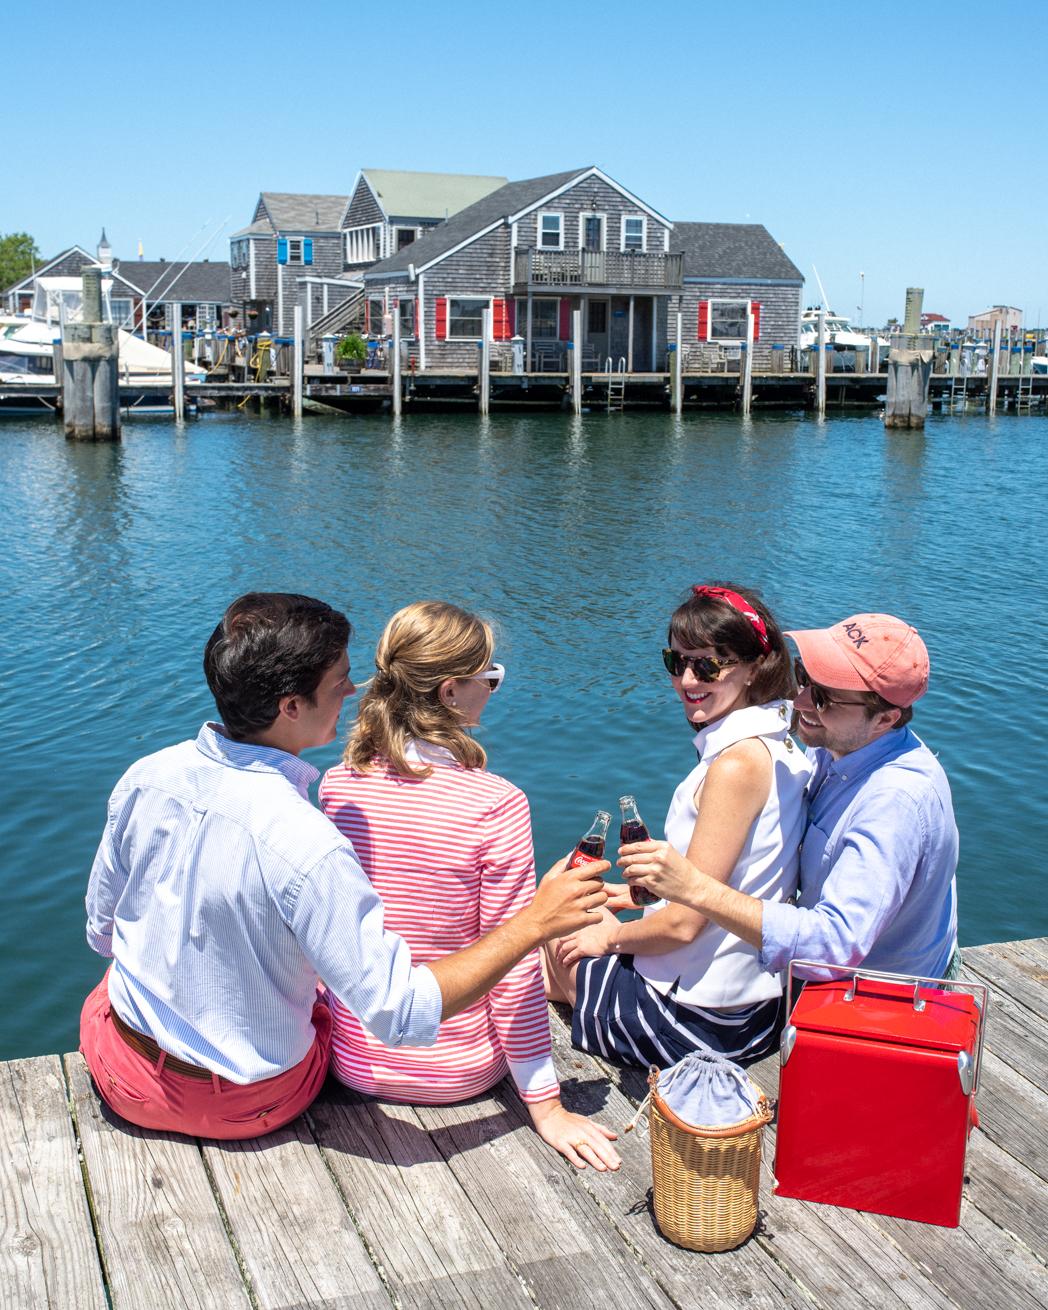 Stacie Flinner Nantucket Island Guide-44.jpg